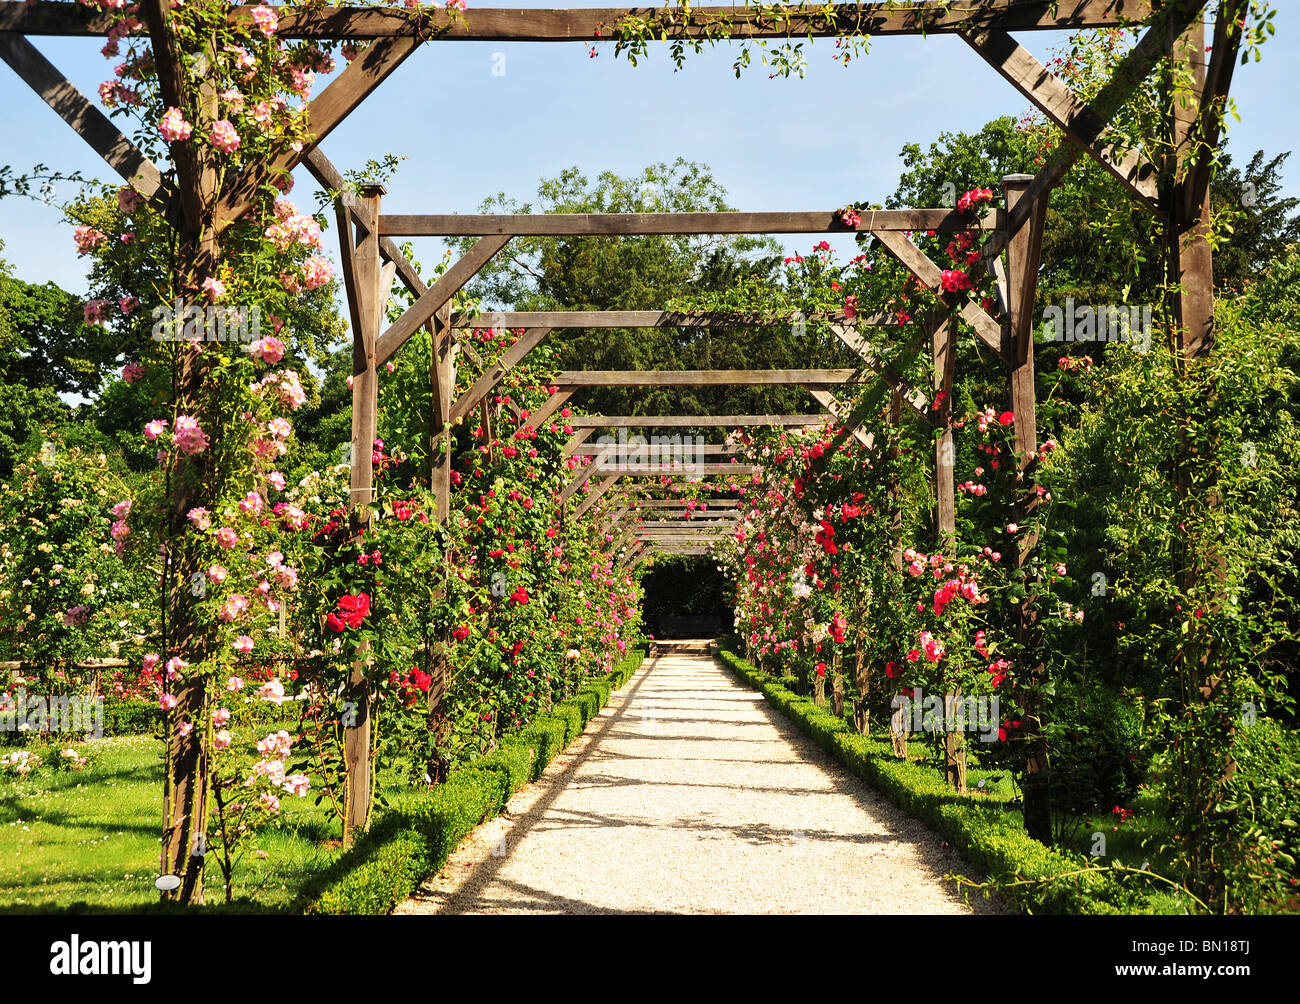 Garden Parc Stock Photos & Garden Parc Stock Images - Alamy